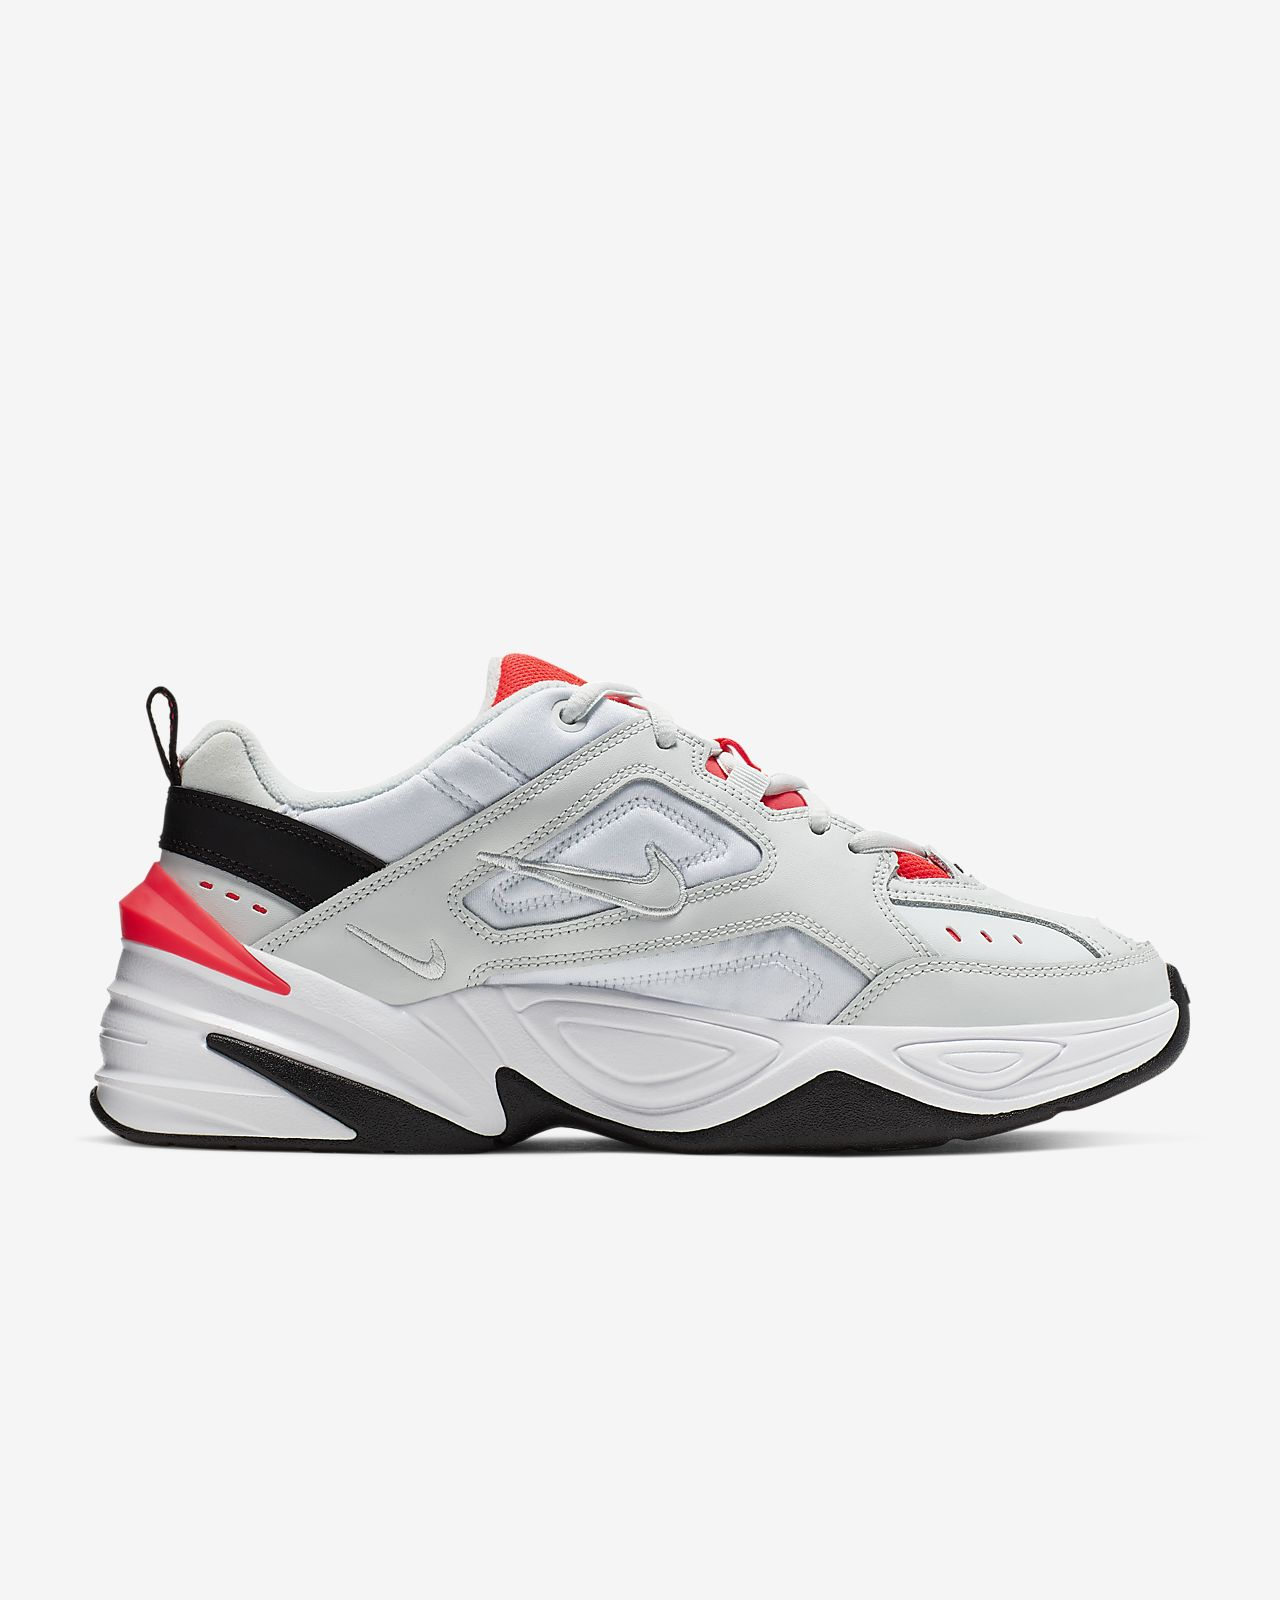 ad7ad5efc388b Low Resolution Nike M2K Tekno Shoe Nike M2K Tekno Shoe